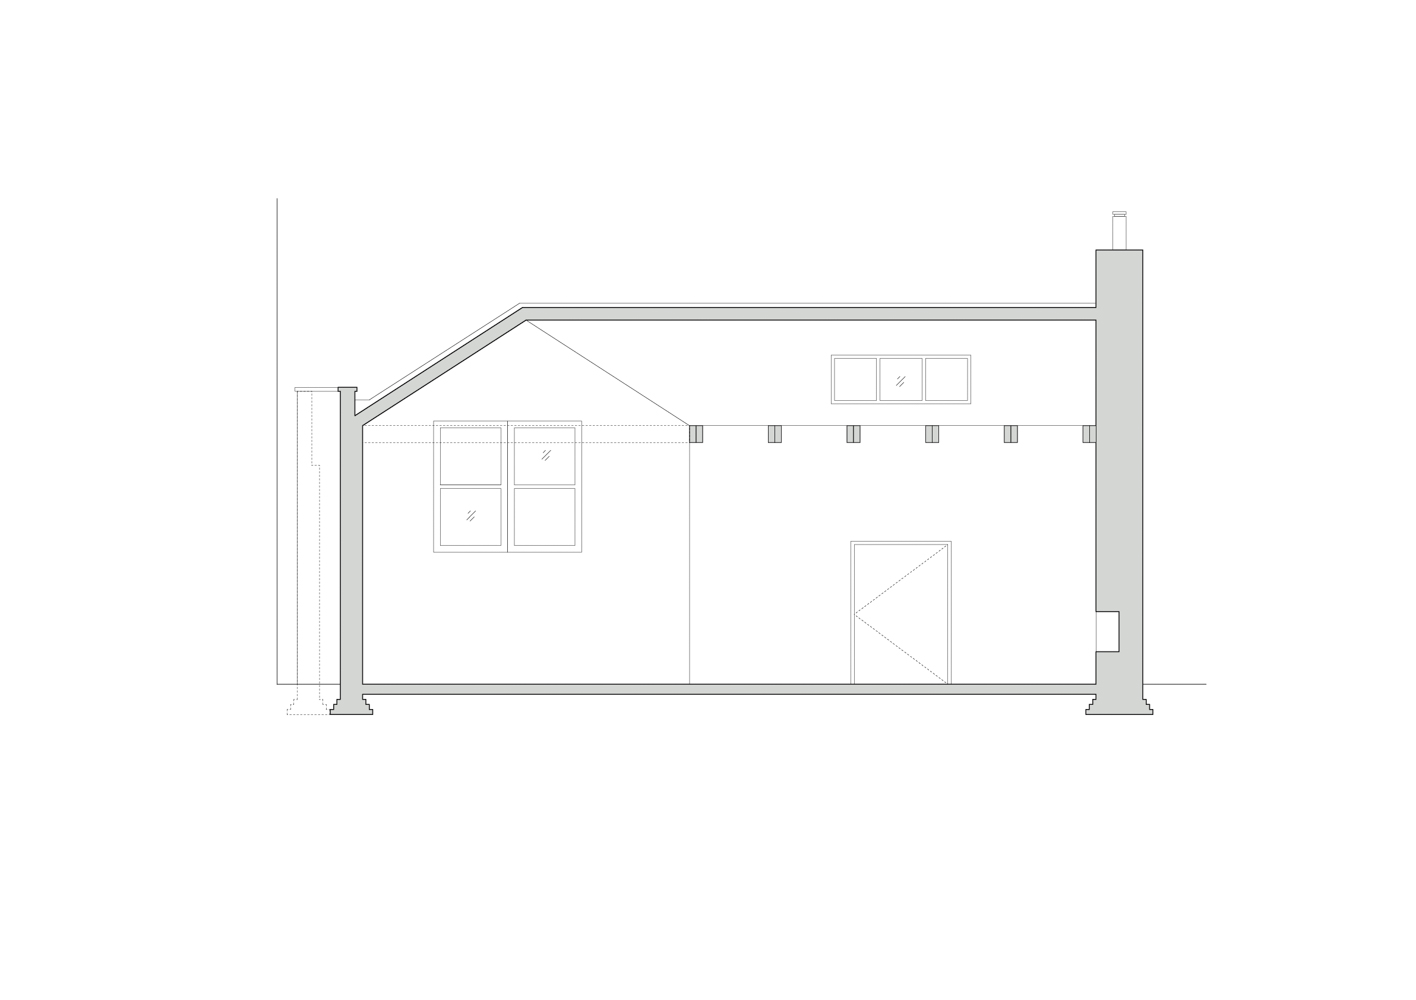 defoe-road-paper-house-project-the-design-emotive-20.jpg